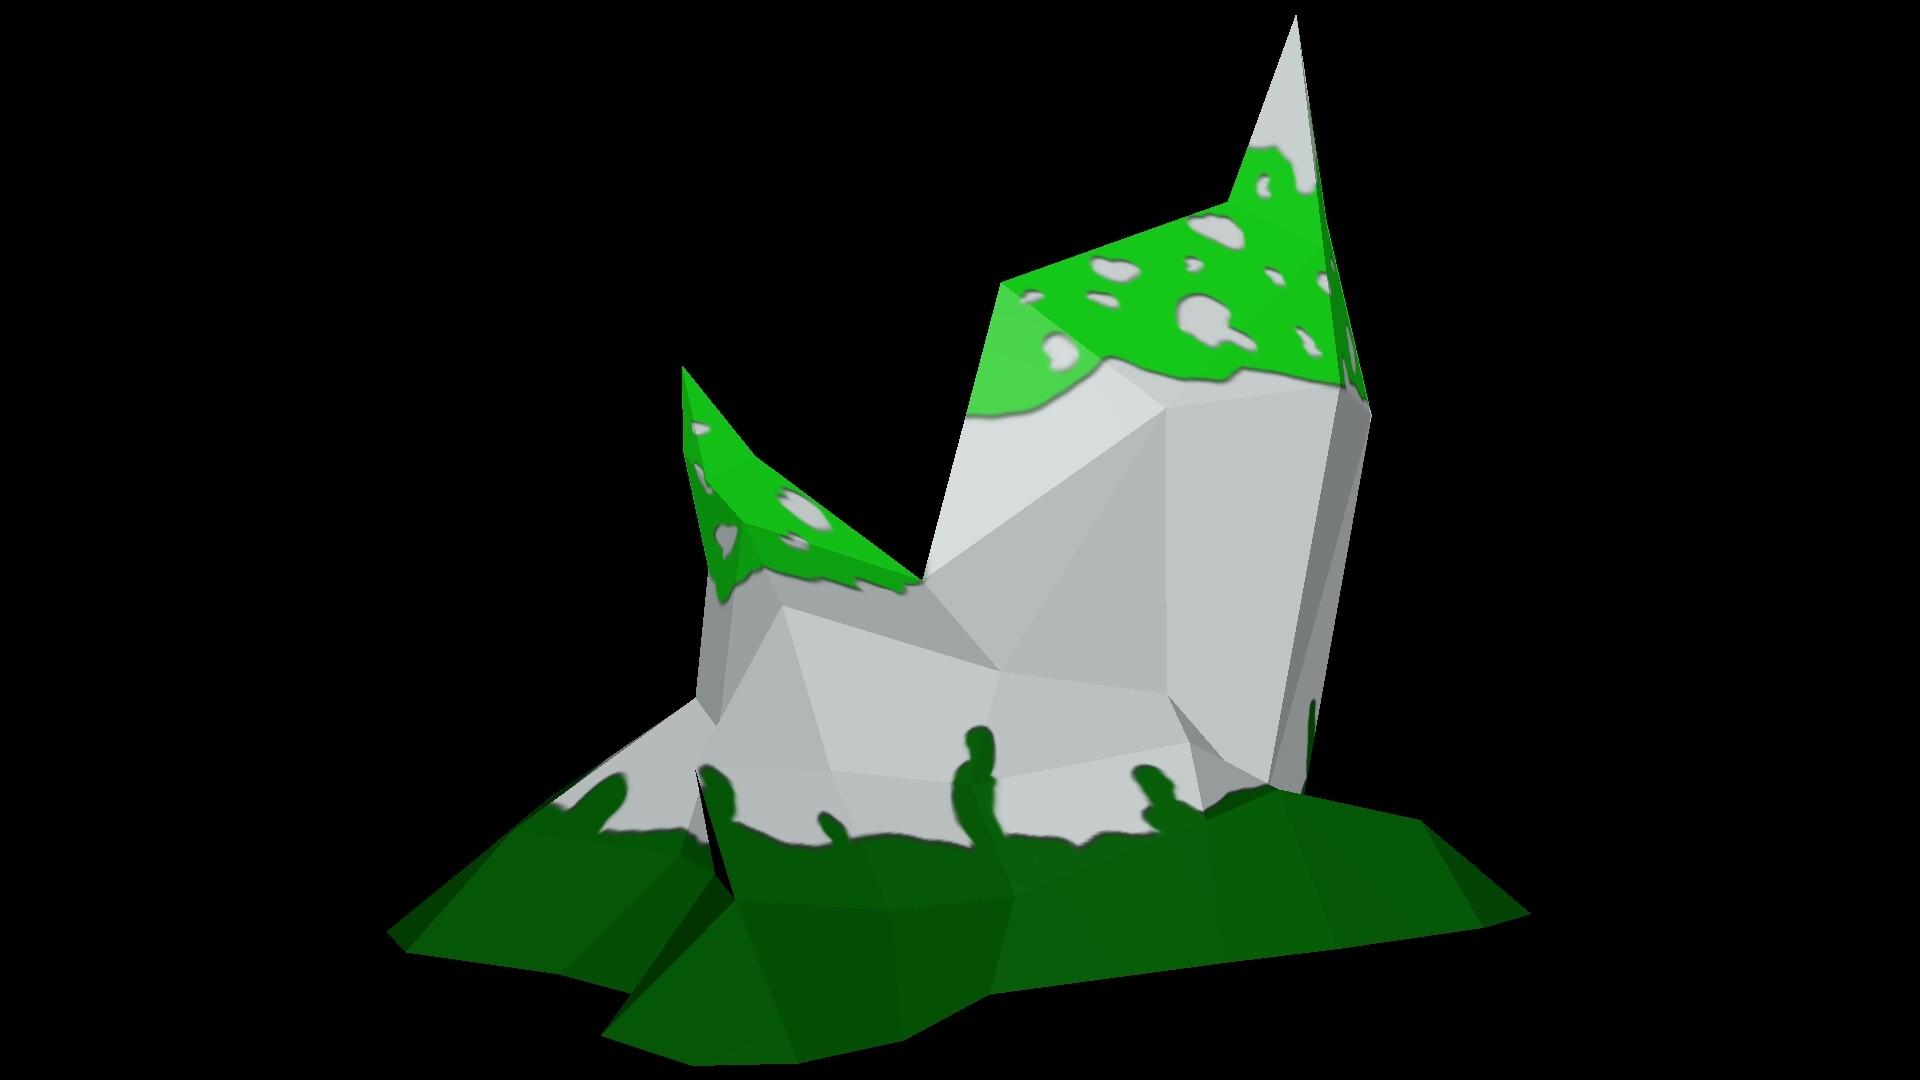 Par'N - Last Hortum - Mossy Mountain